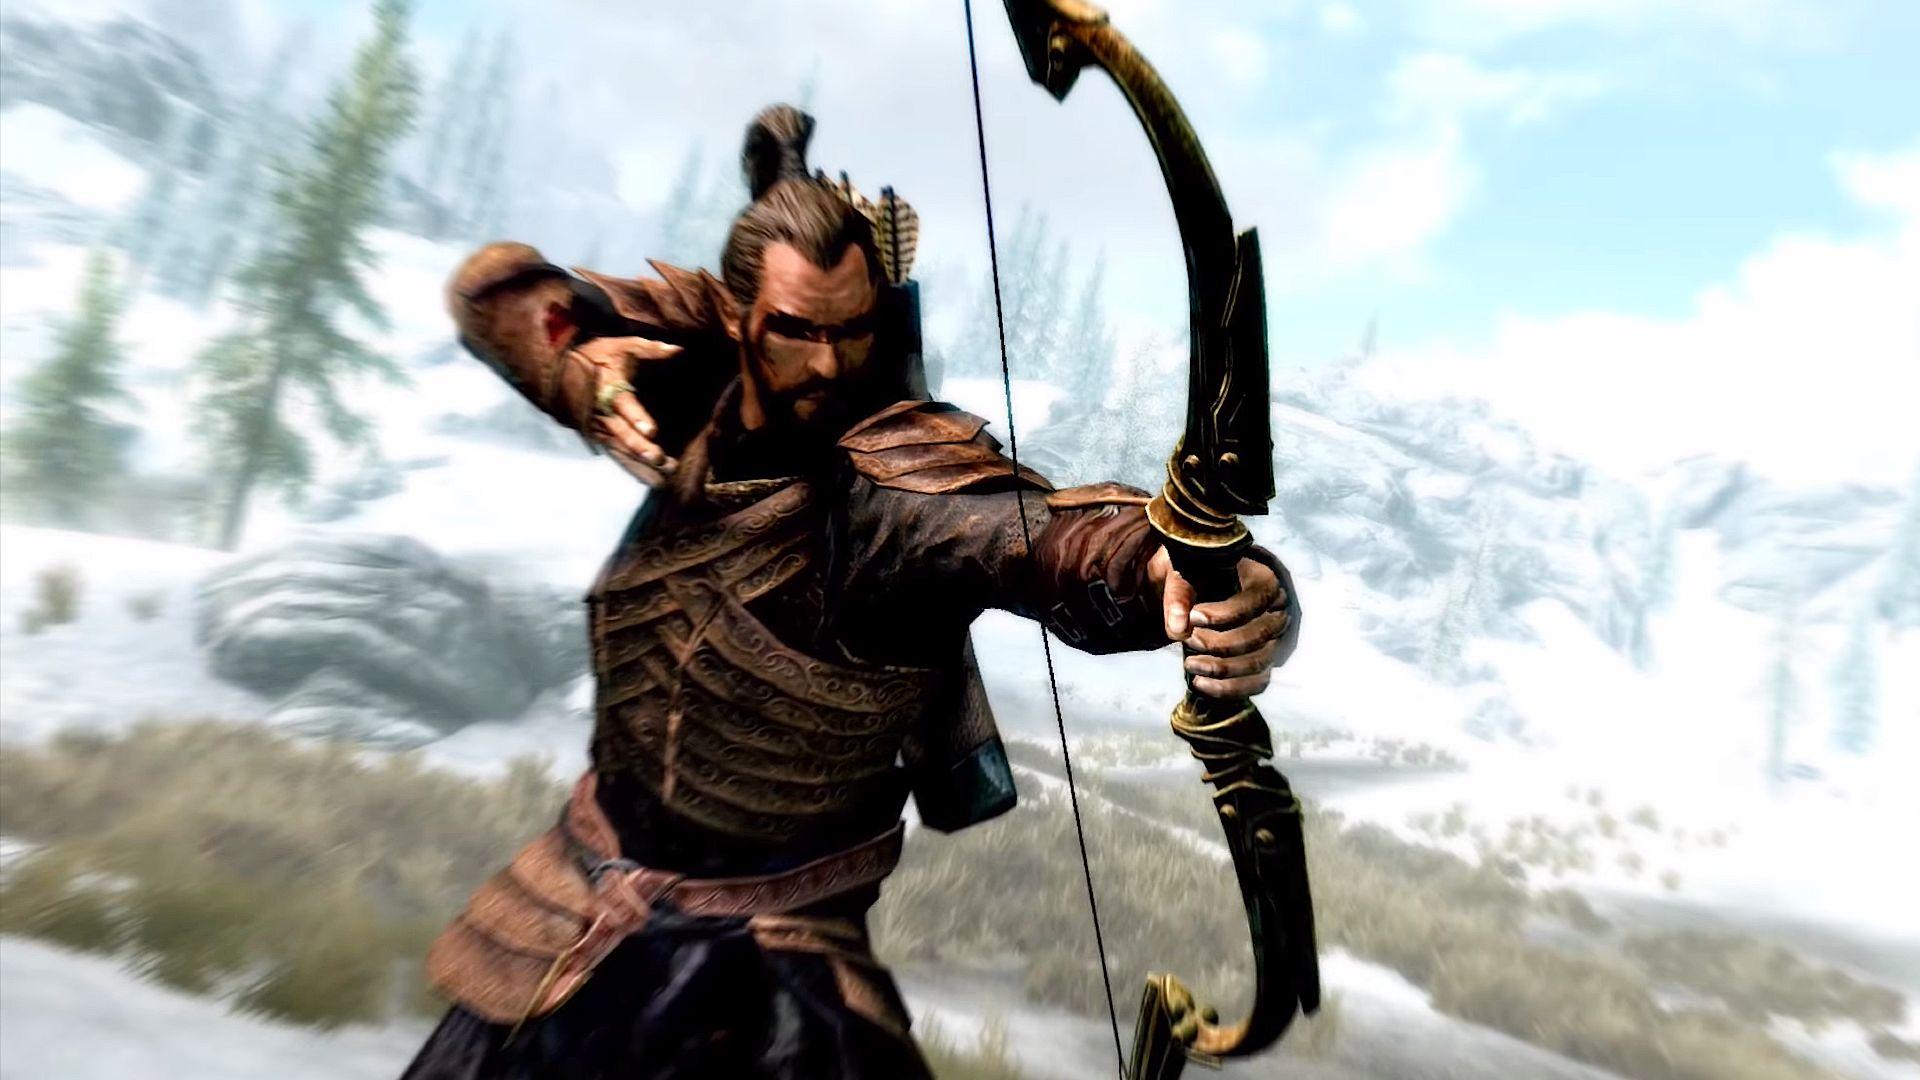 Weird Skyrim lore: Wood Elves and the church of keto